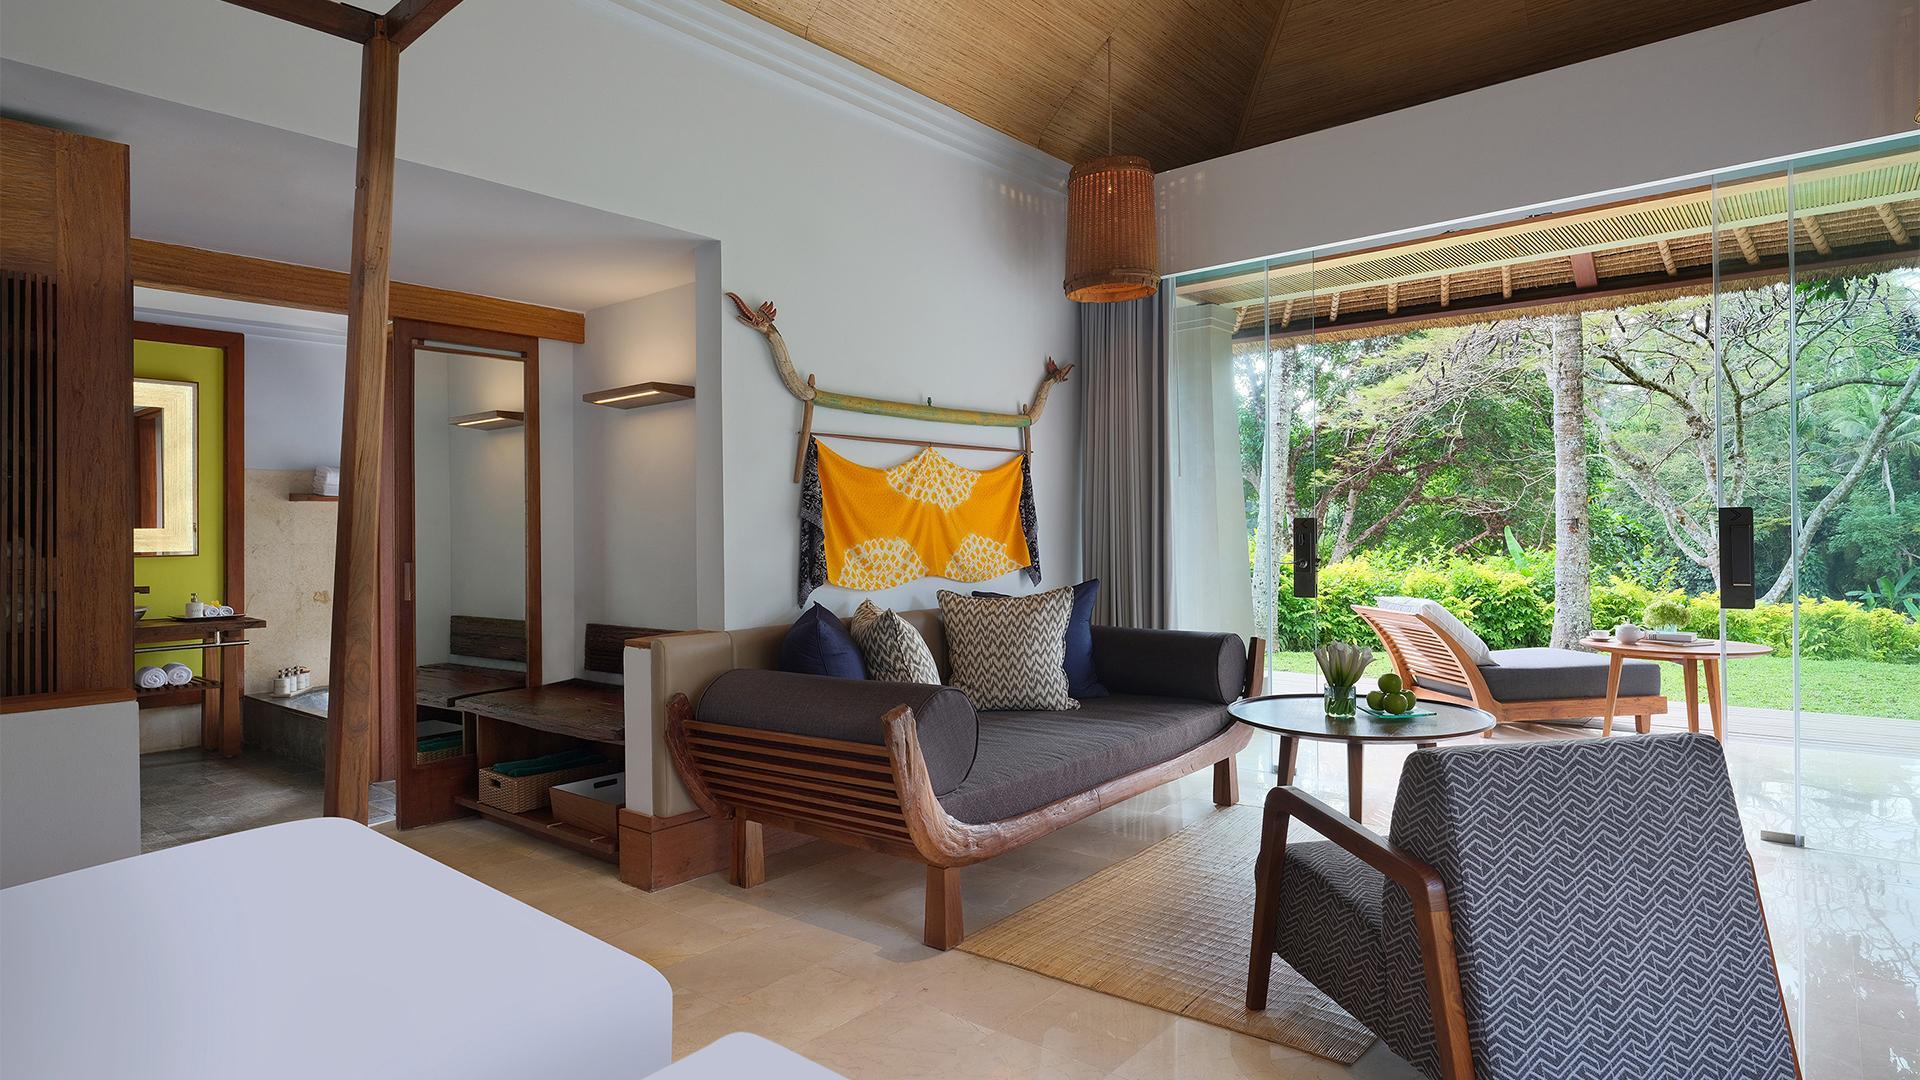 Heavenly Pool Villa image 1 at Maya Ubud Resort & Spa by Kabupaten Gianyar, Bali, Indonesia